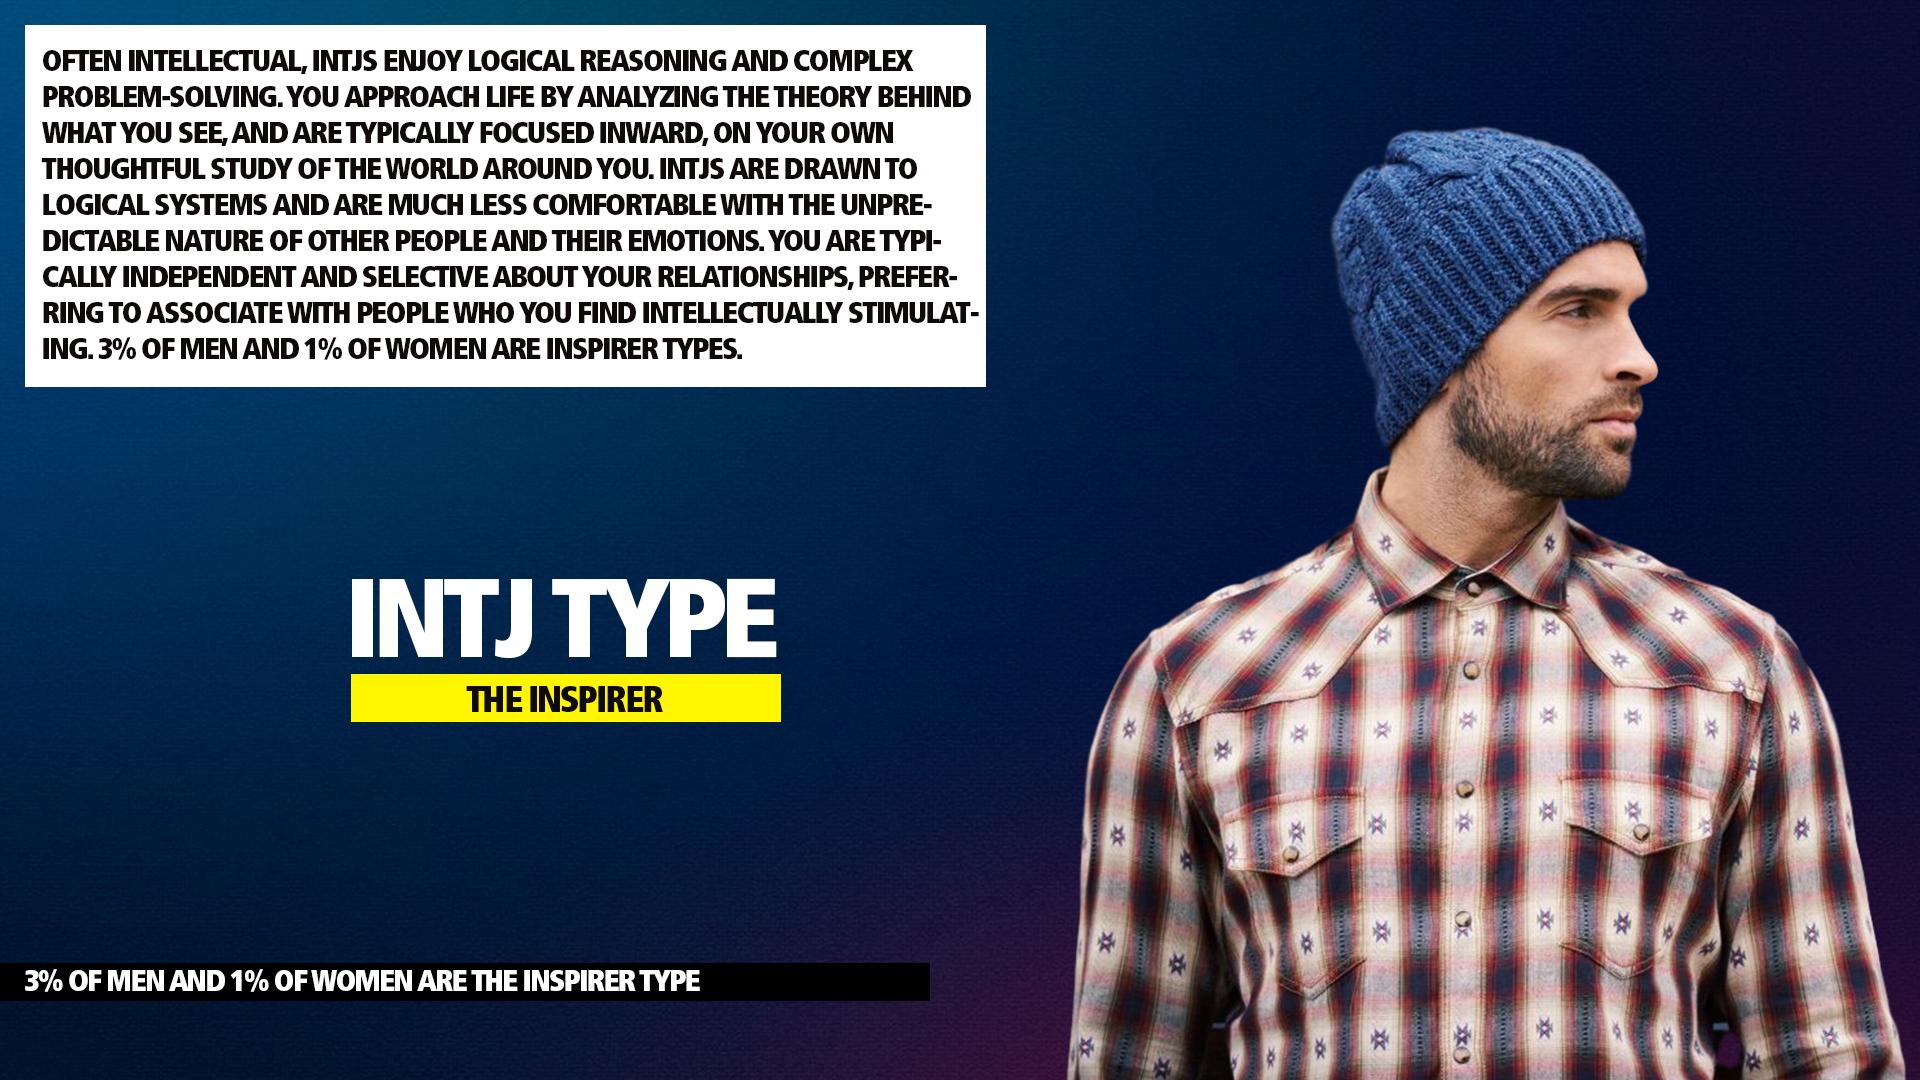 MBTI INTJ Inspirer Type